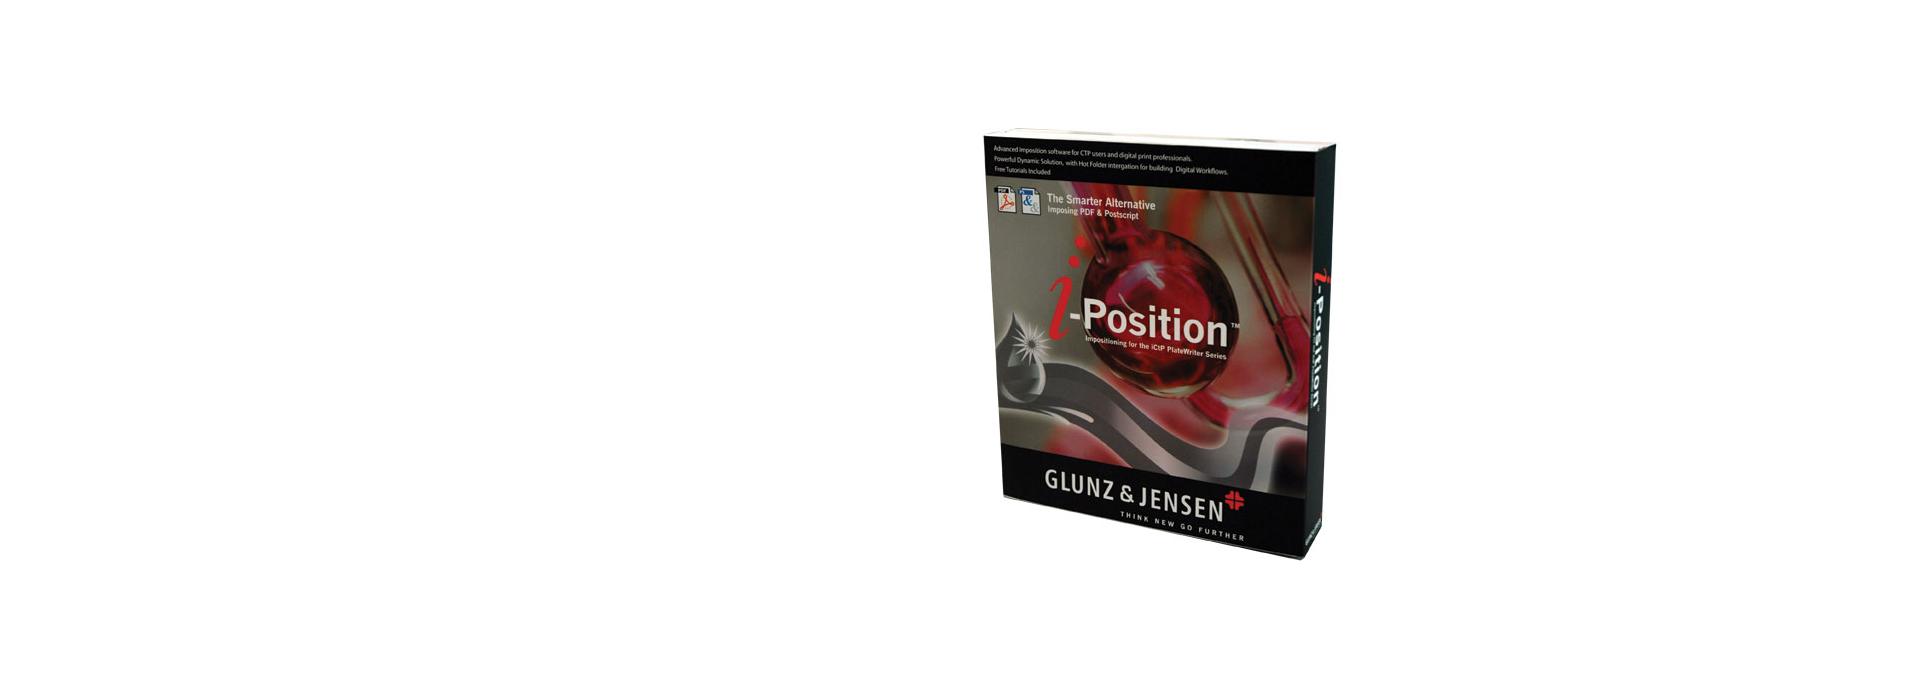 i-Position